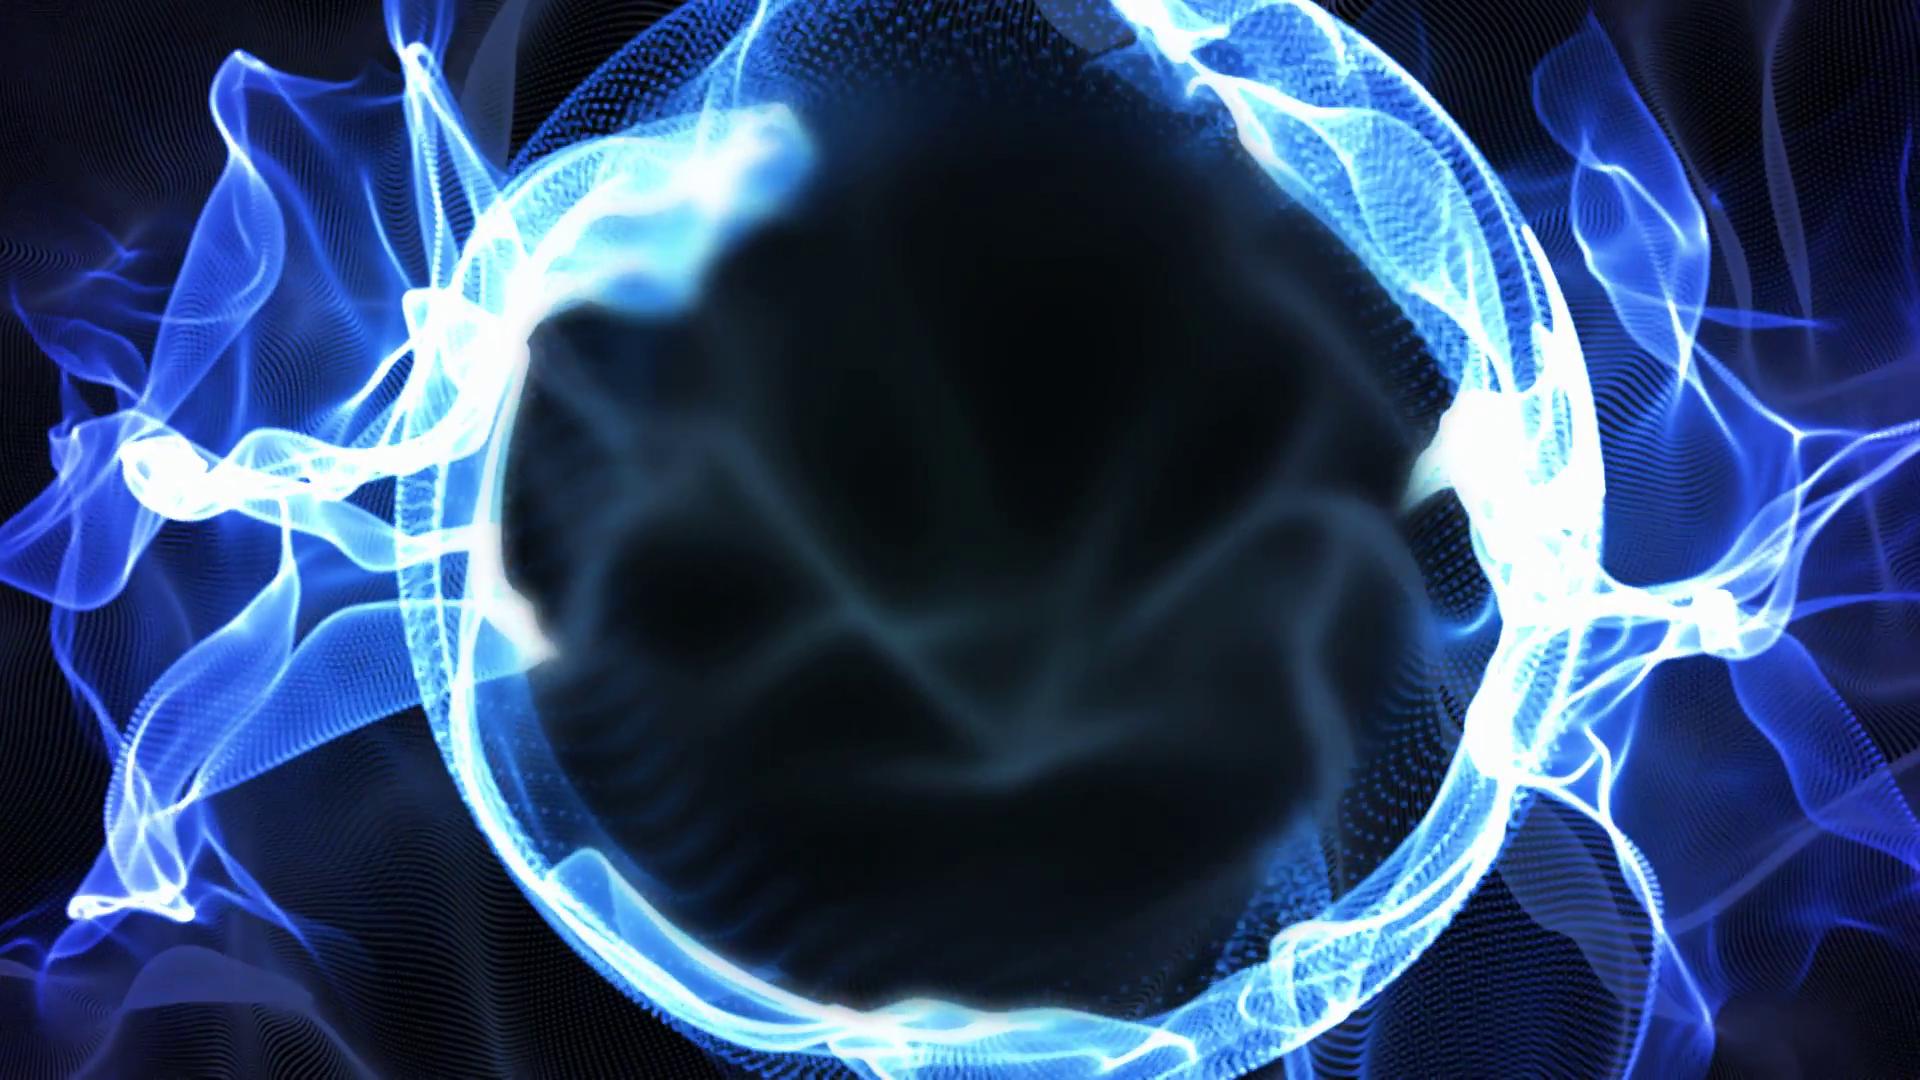 Plasma abstract photo